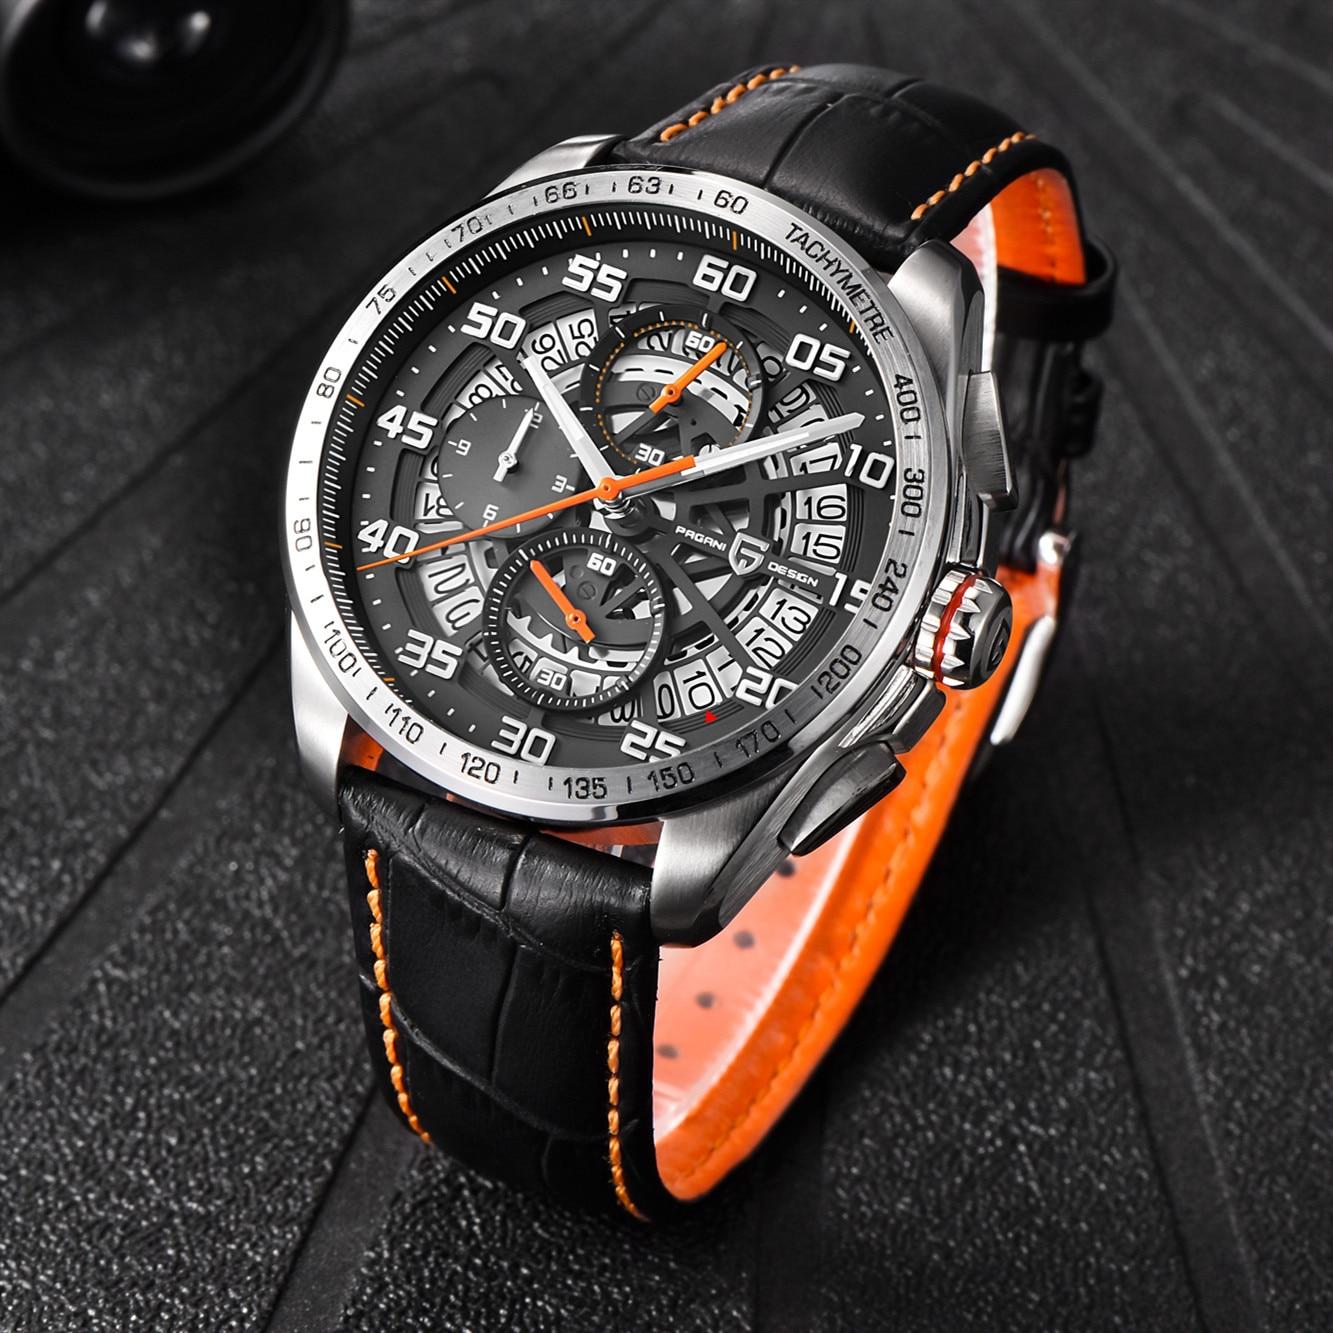 Relojes deportivos de marca de diseño PAGANI para hombre, cronógrafo militar, reloj militar de cuarzo, acero inoxidable, reloj militar para hombre, reloj Masculino, Saat - 6